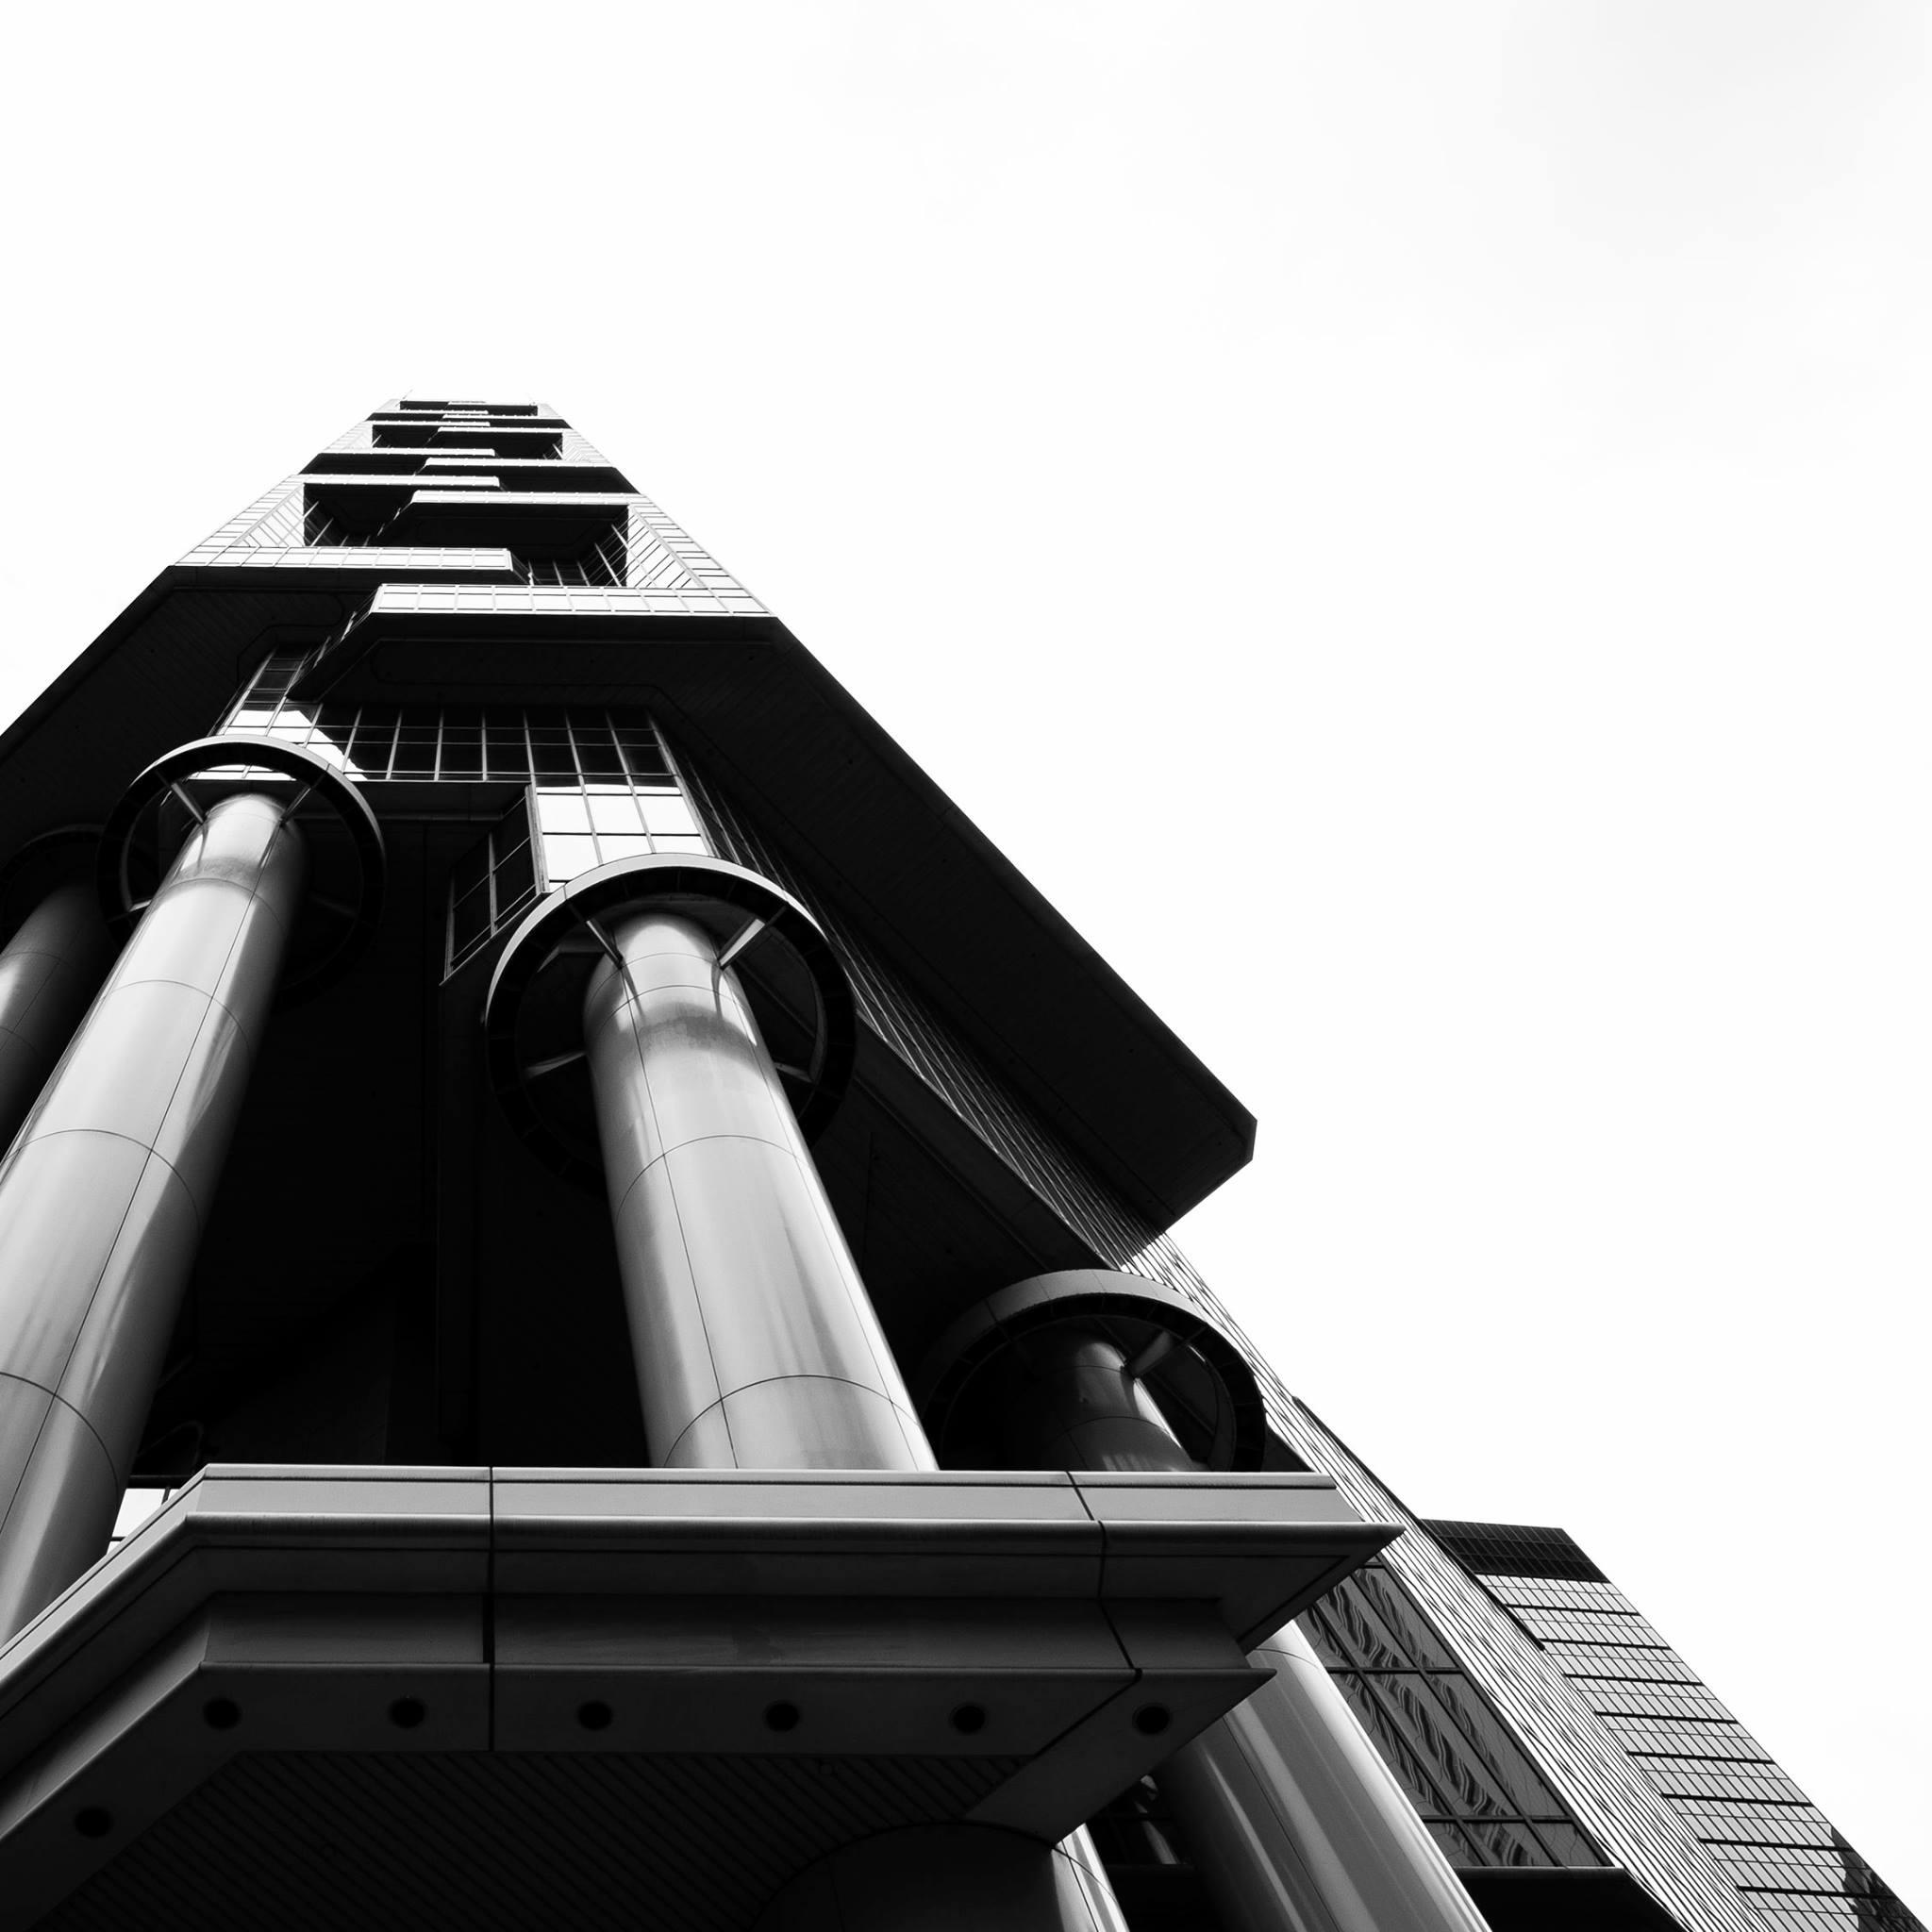 kevin-krautgartner-architecture-photography-10